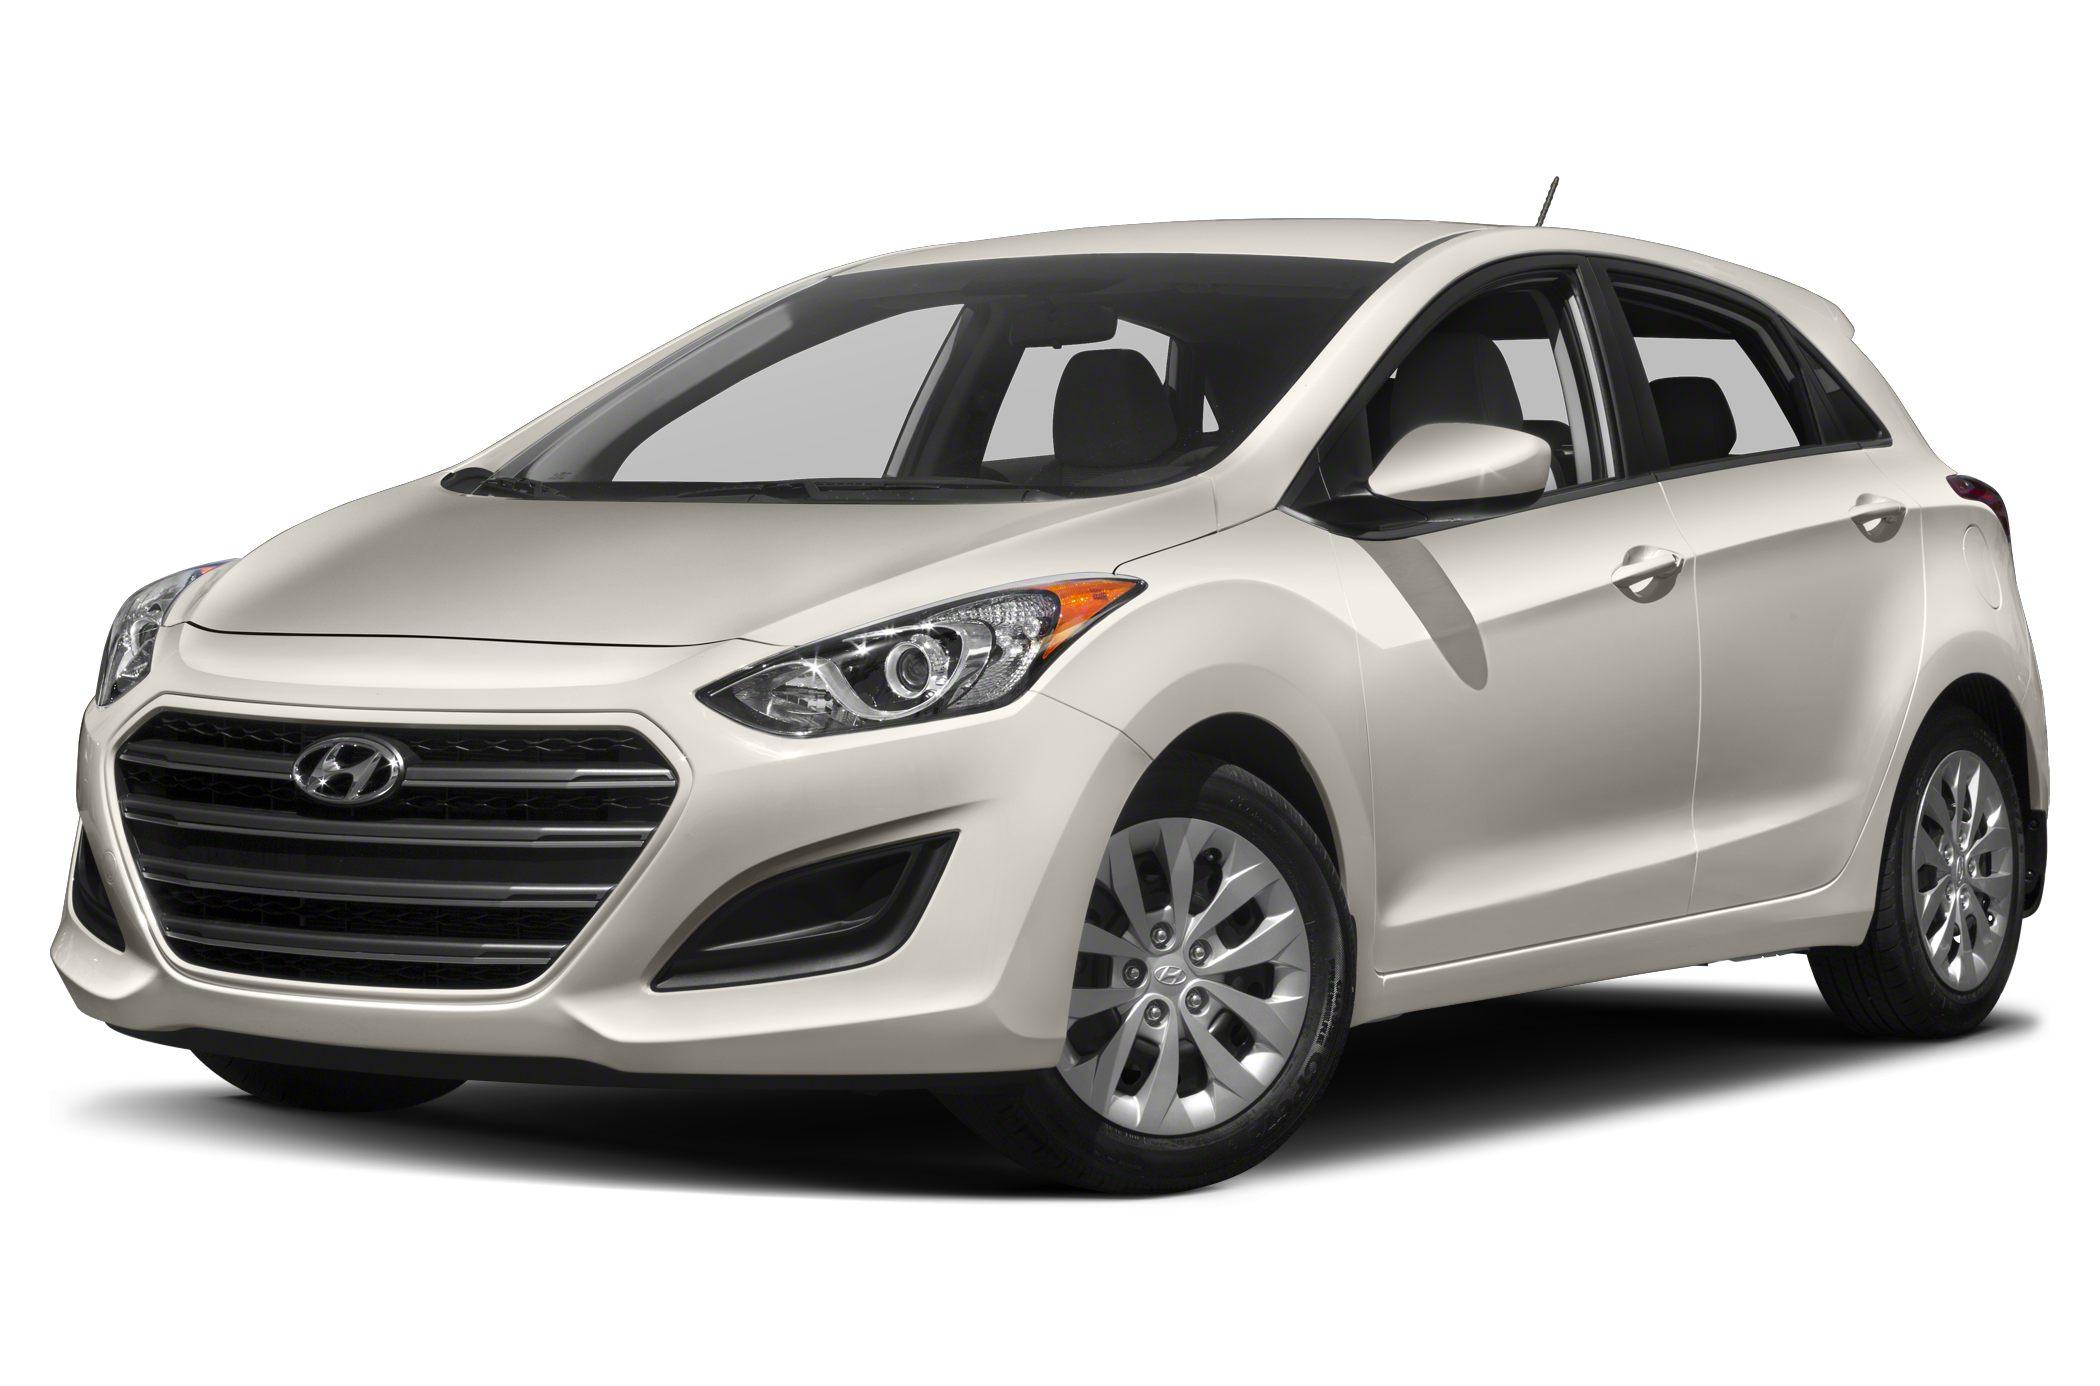 Bmw Lease Deals Ny >> Hyundai Elantra Lease Calculator | Autos Post